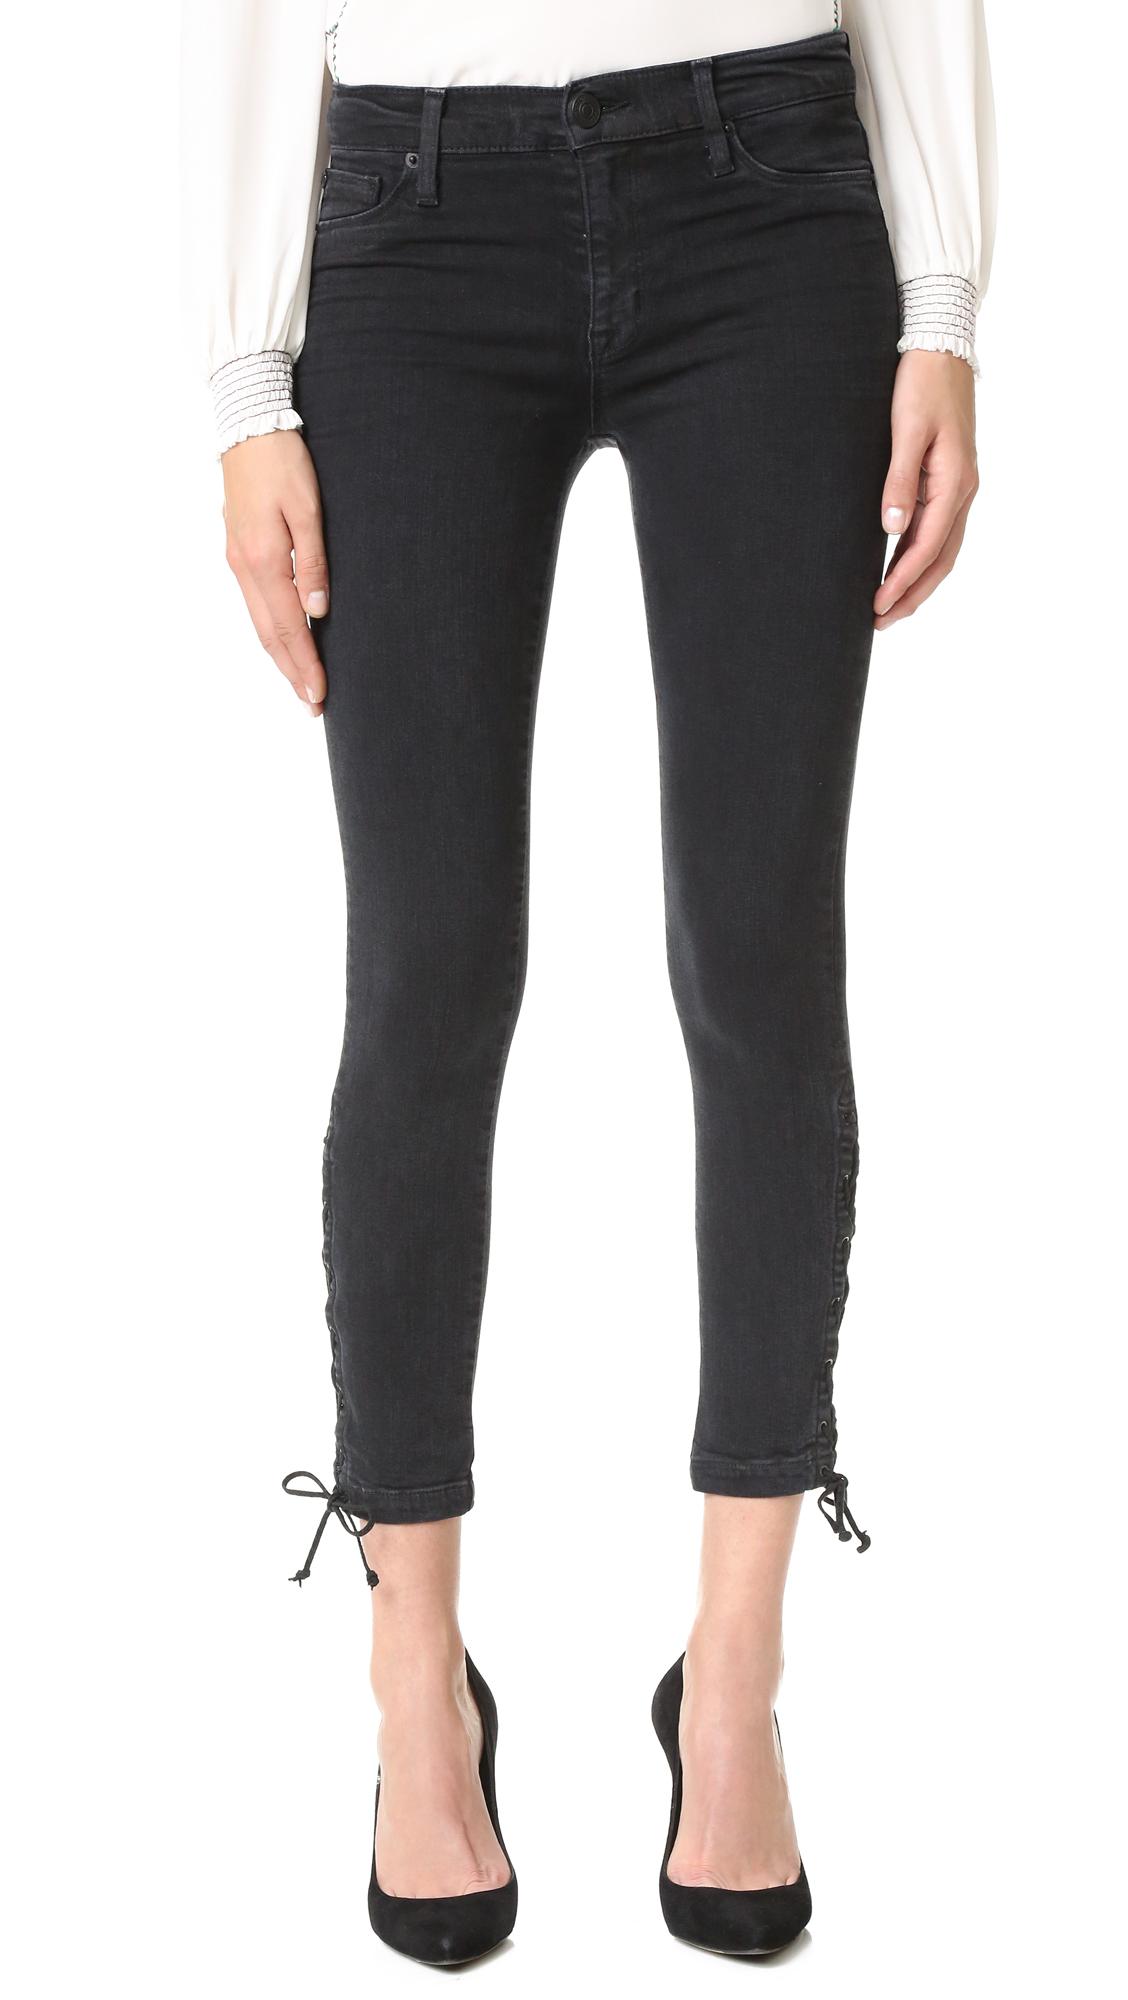 Hudson Nix Lace Up Jeans - Mercury Hail at Shopbop